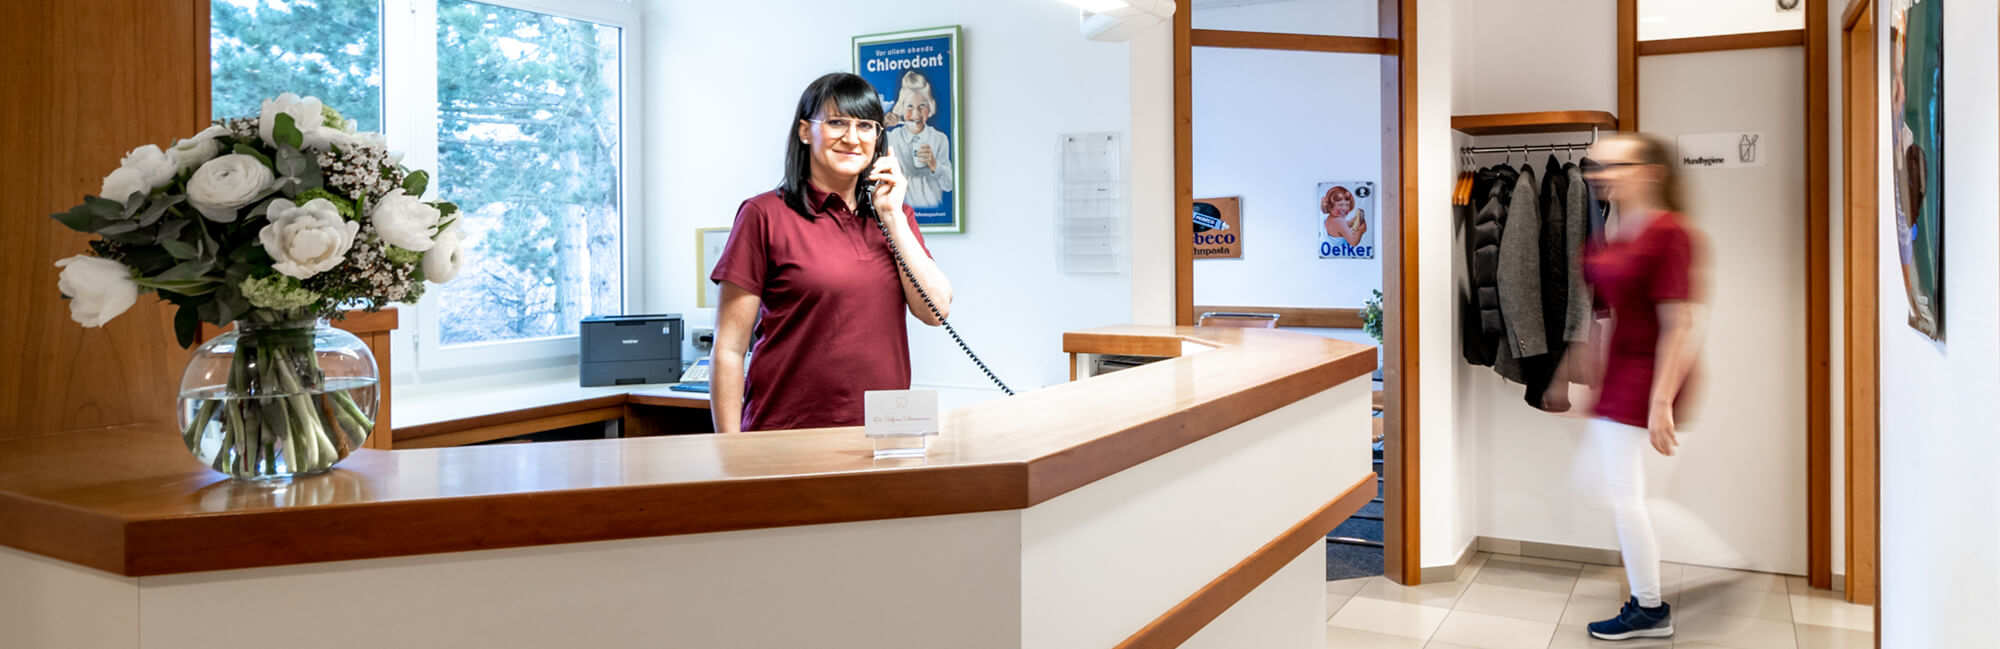 Zahnarzt Hüttlingen - Dr. Scheuermann - Slider Datenschutz